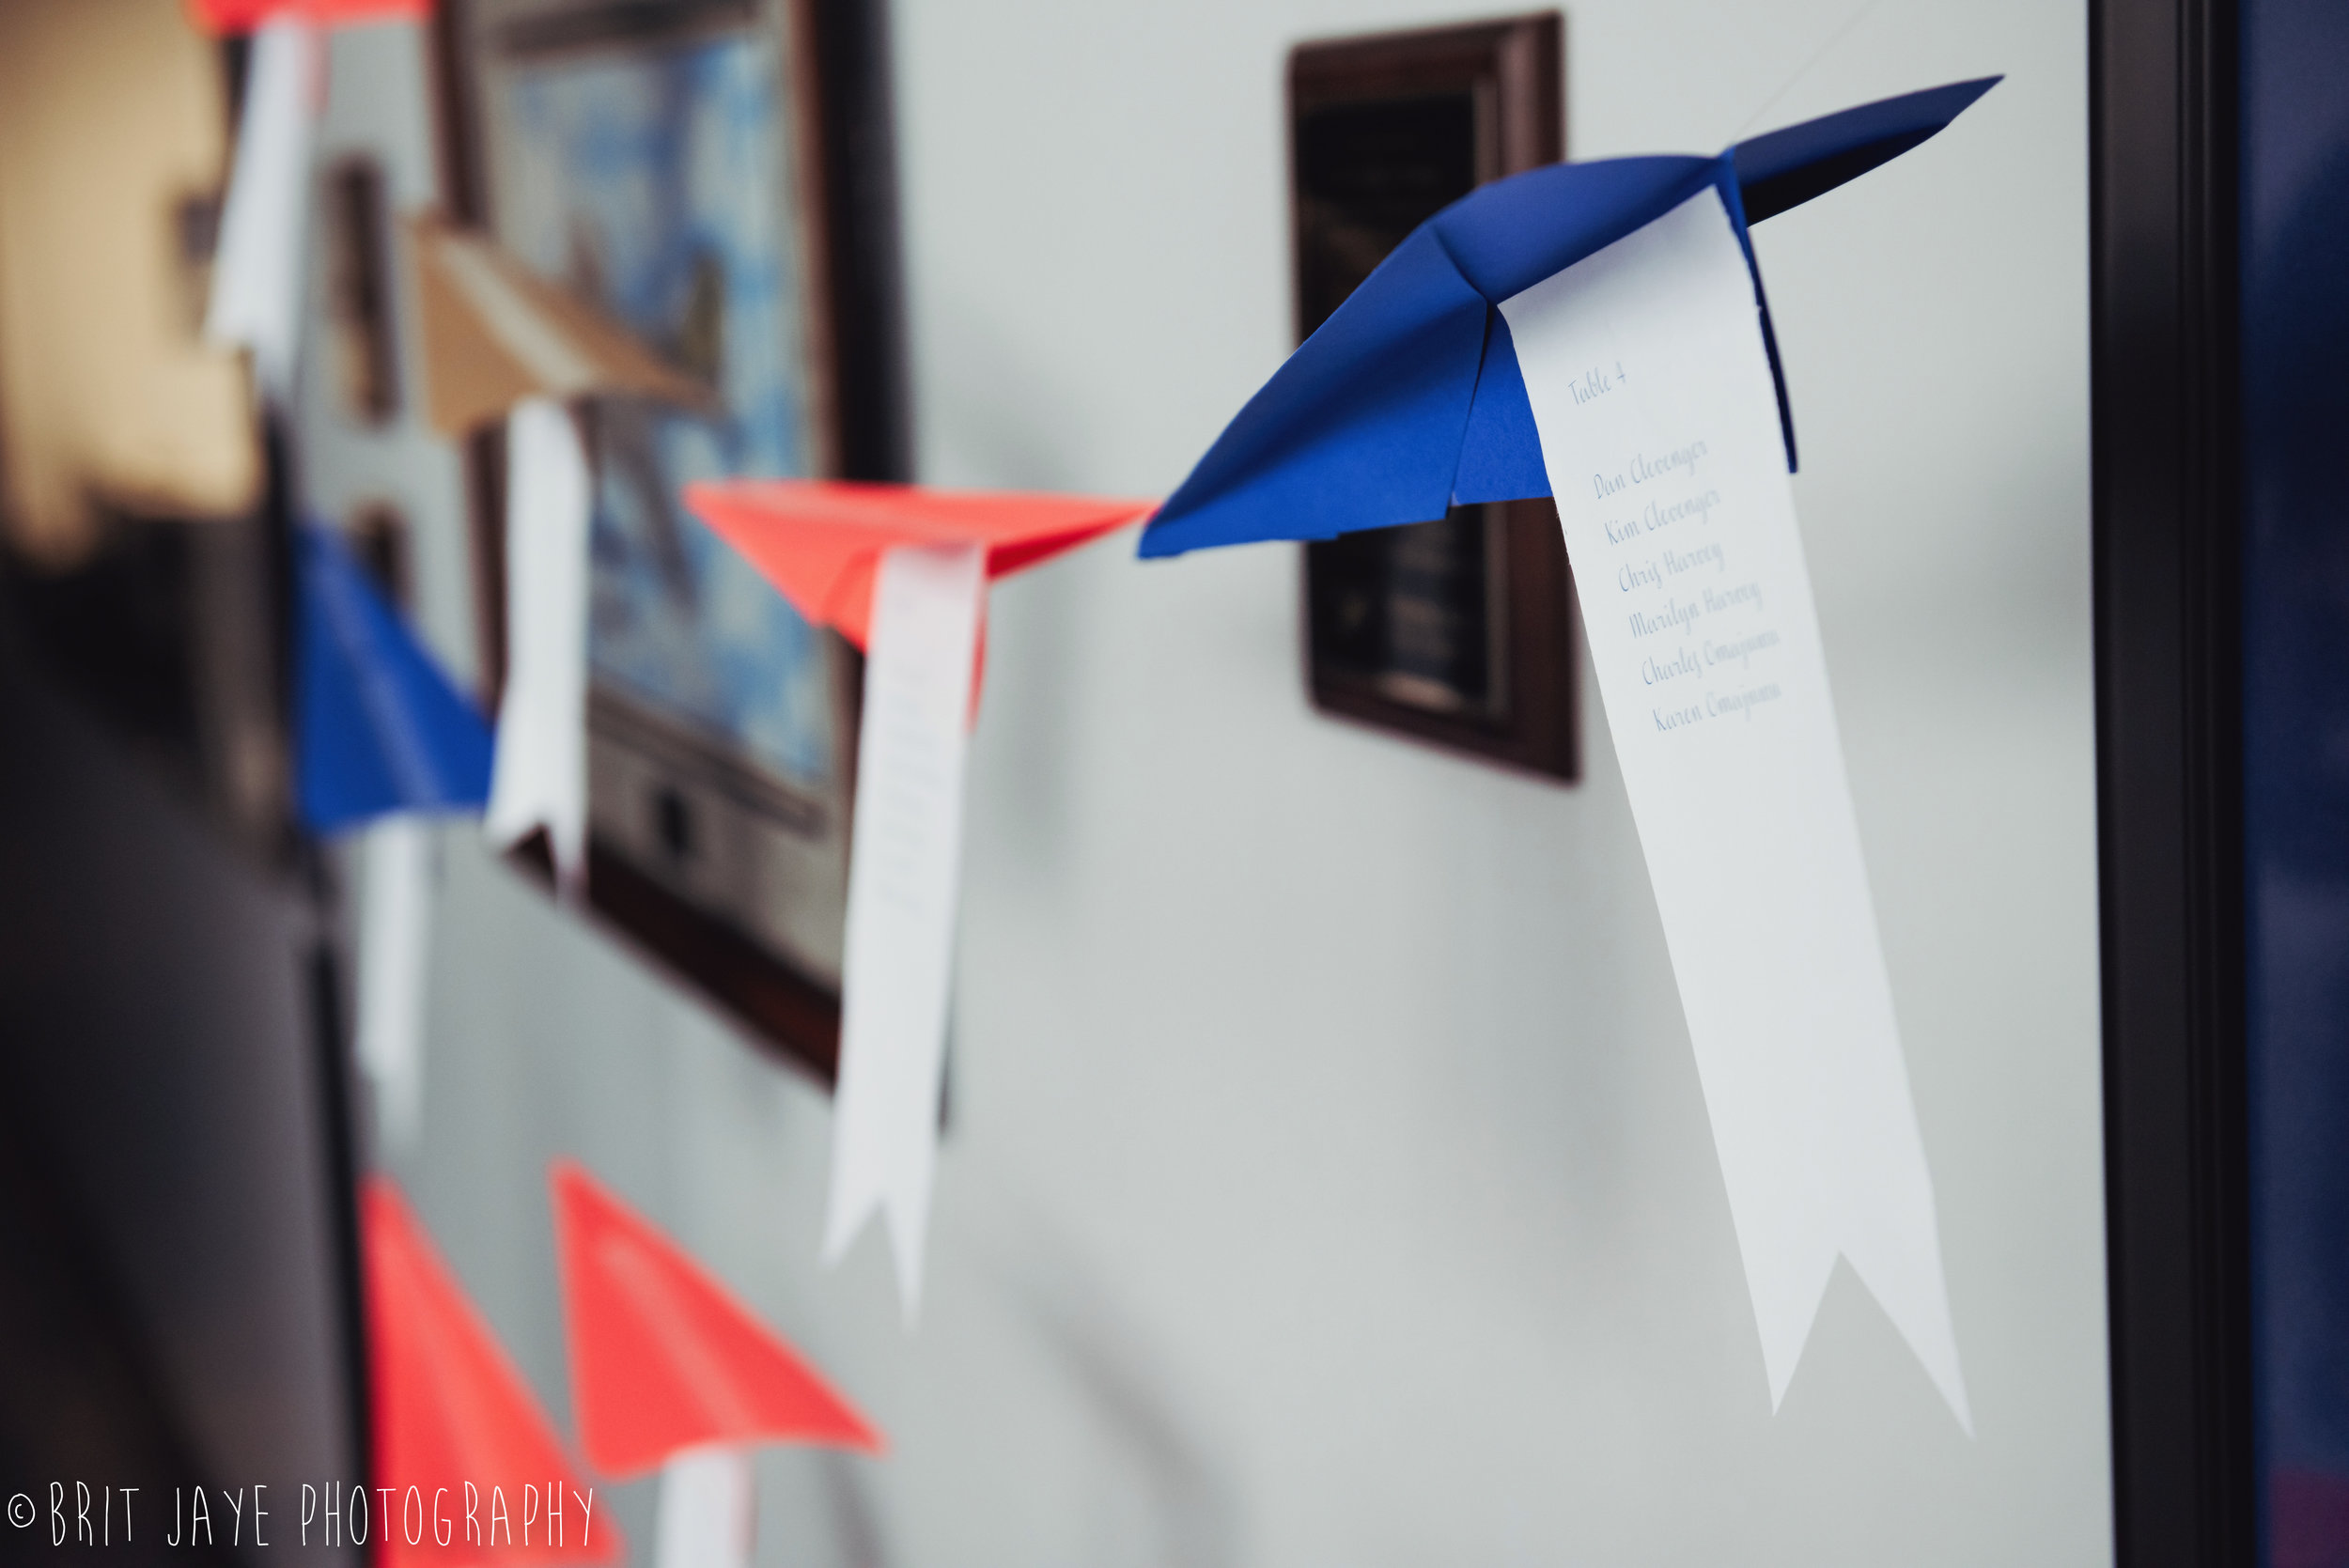 Champaign_aviation_museum_travel_inspired_wedding-31.jpg